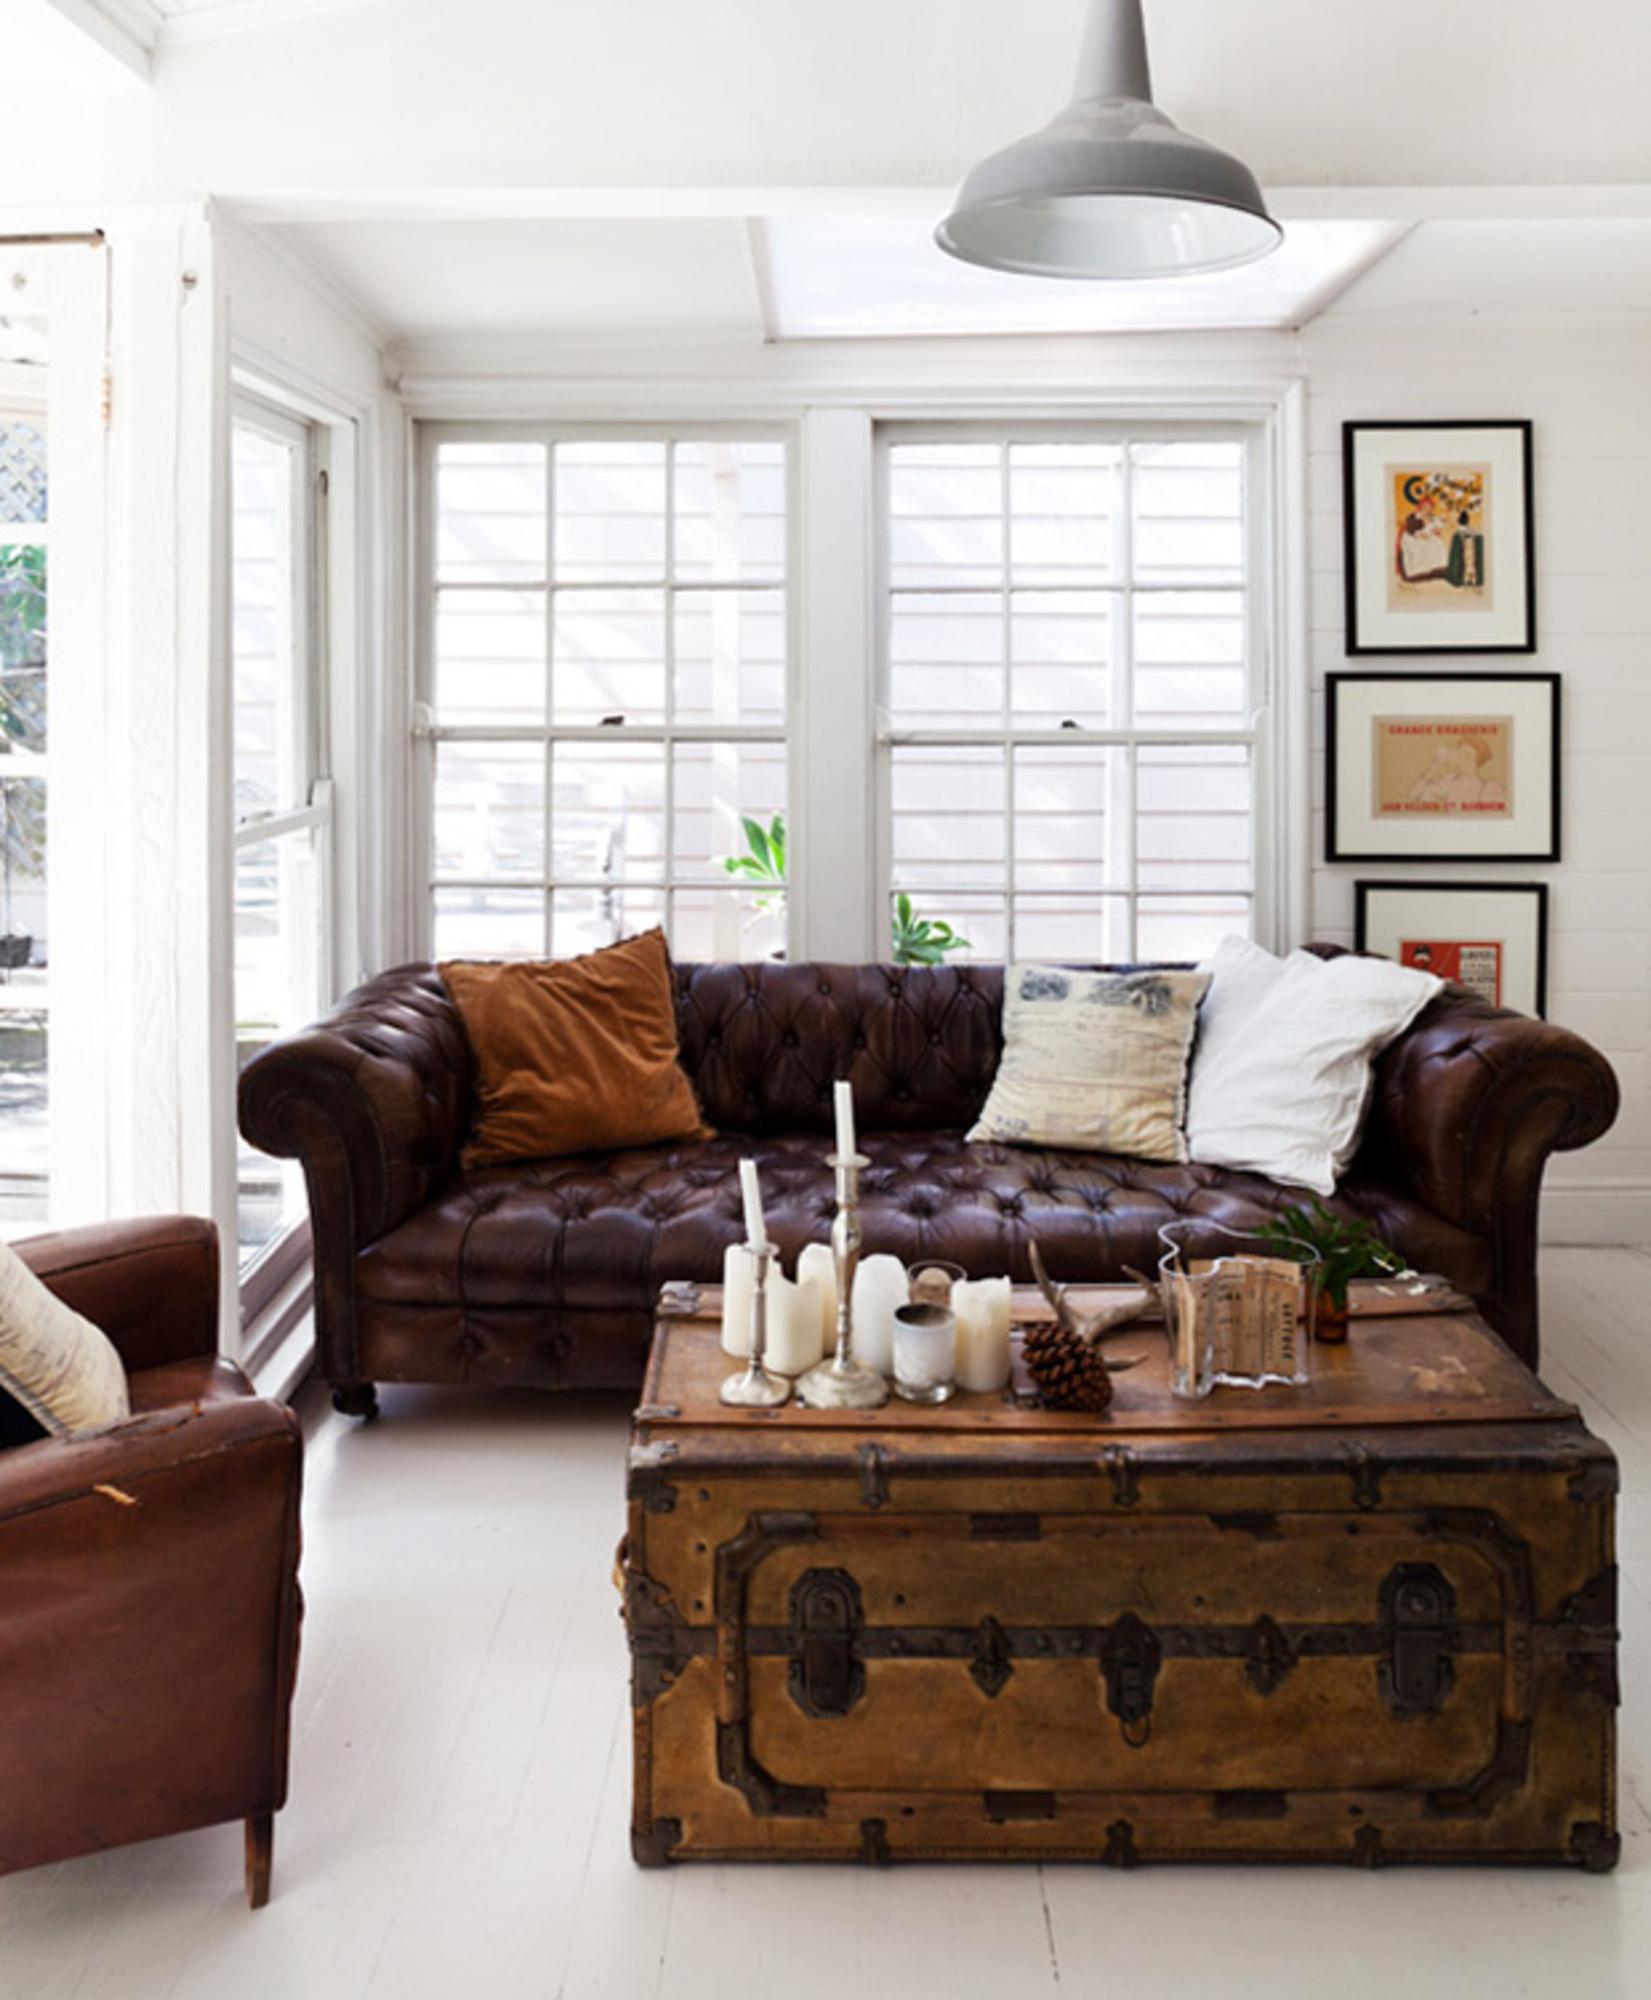 Sof s chesterfield casa de valentina for Casas de sofas en madrid